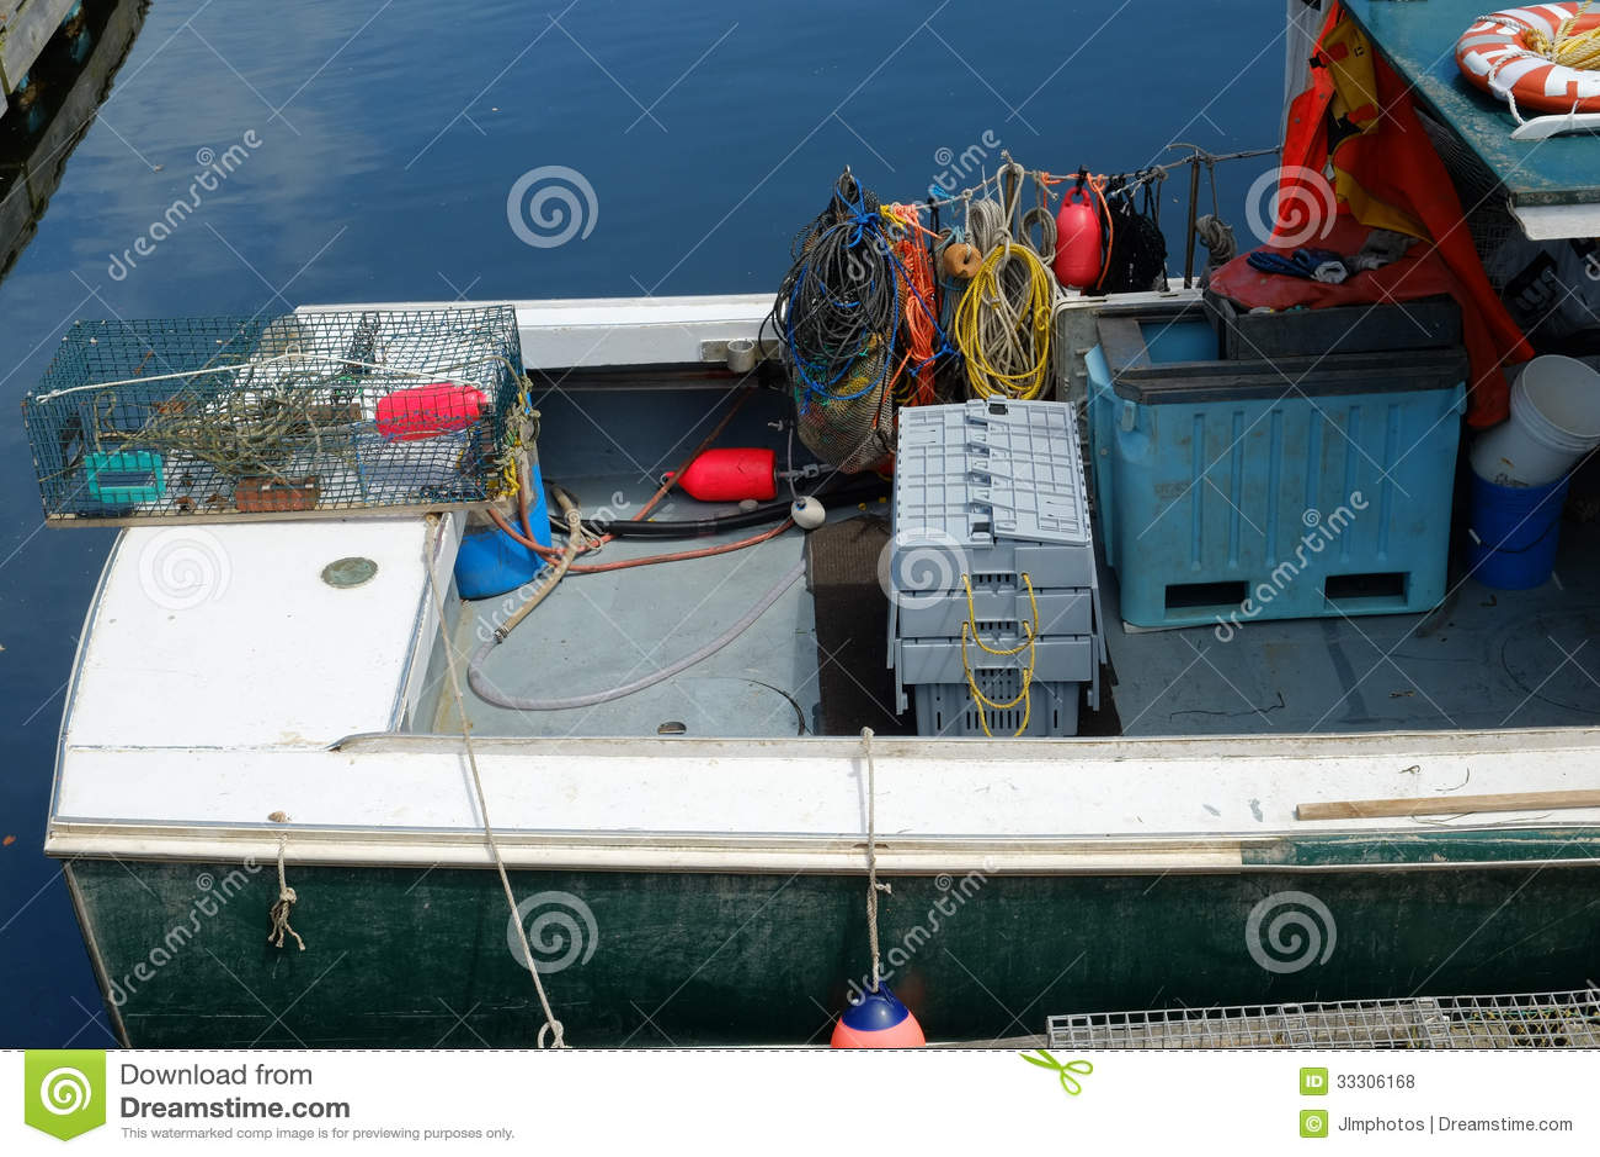 Working Gear on a Lobster boat